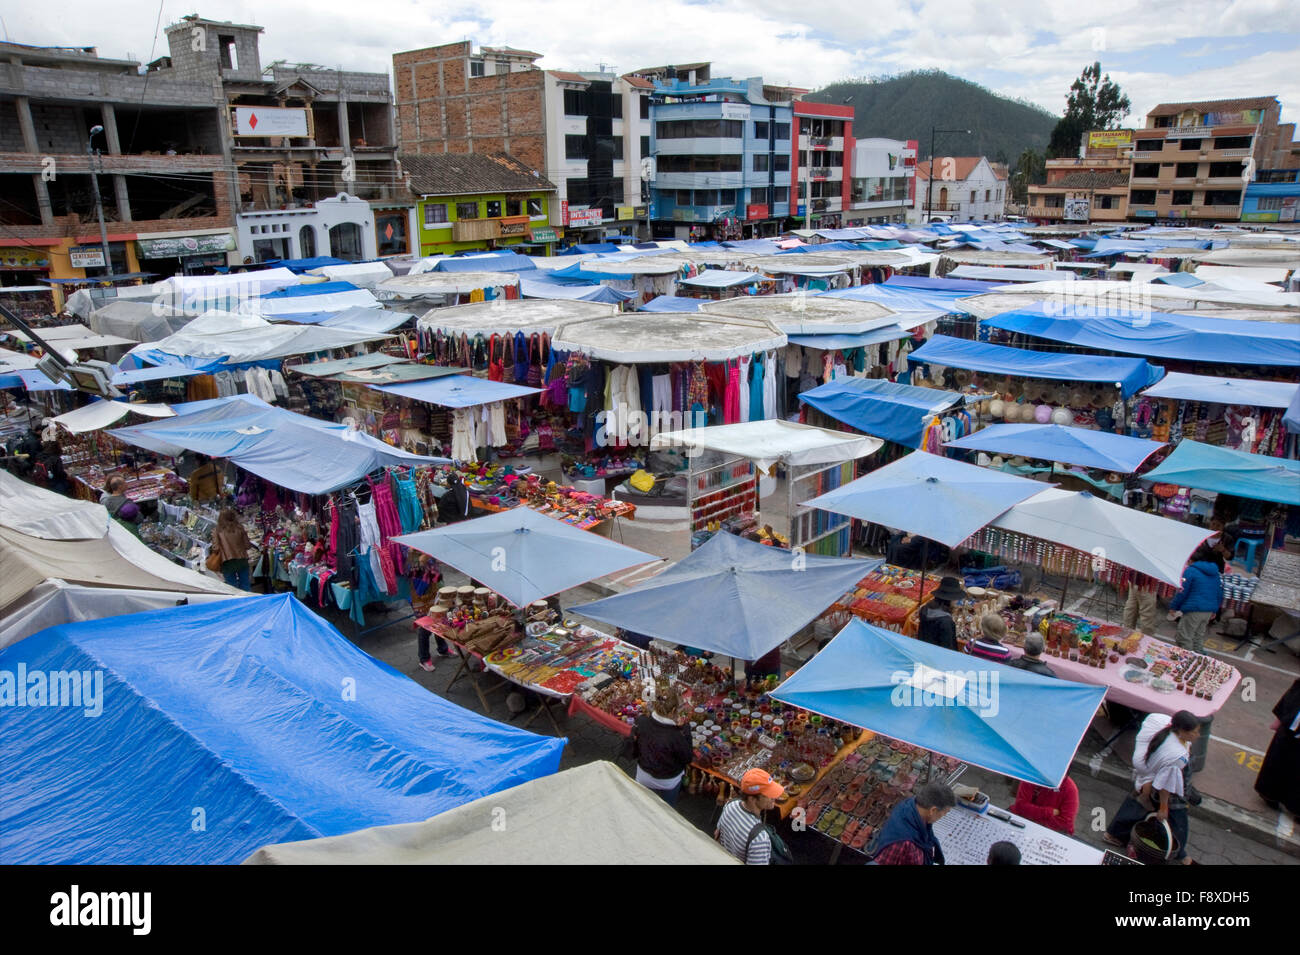 Colorful marketplace in Otavalo, Ecuador - Stock Image